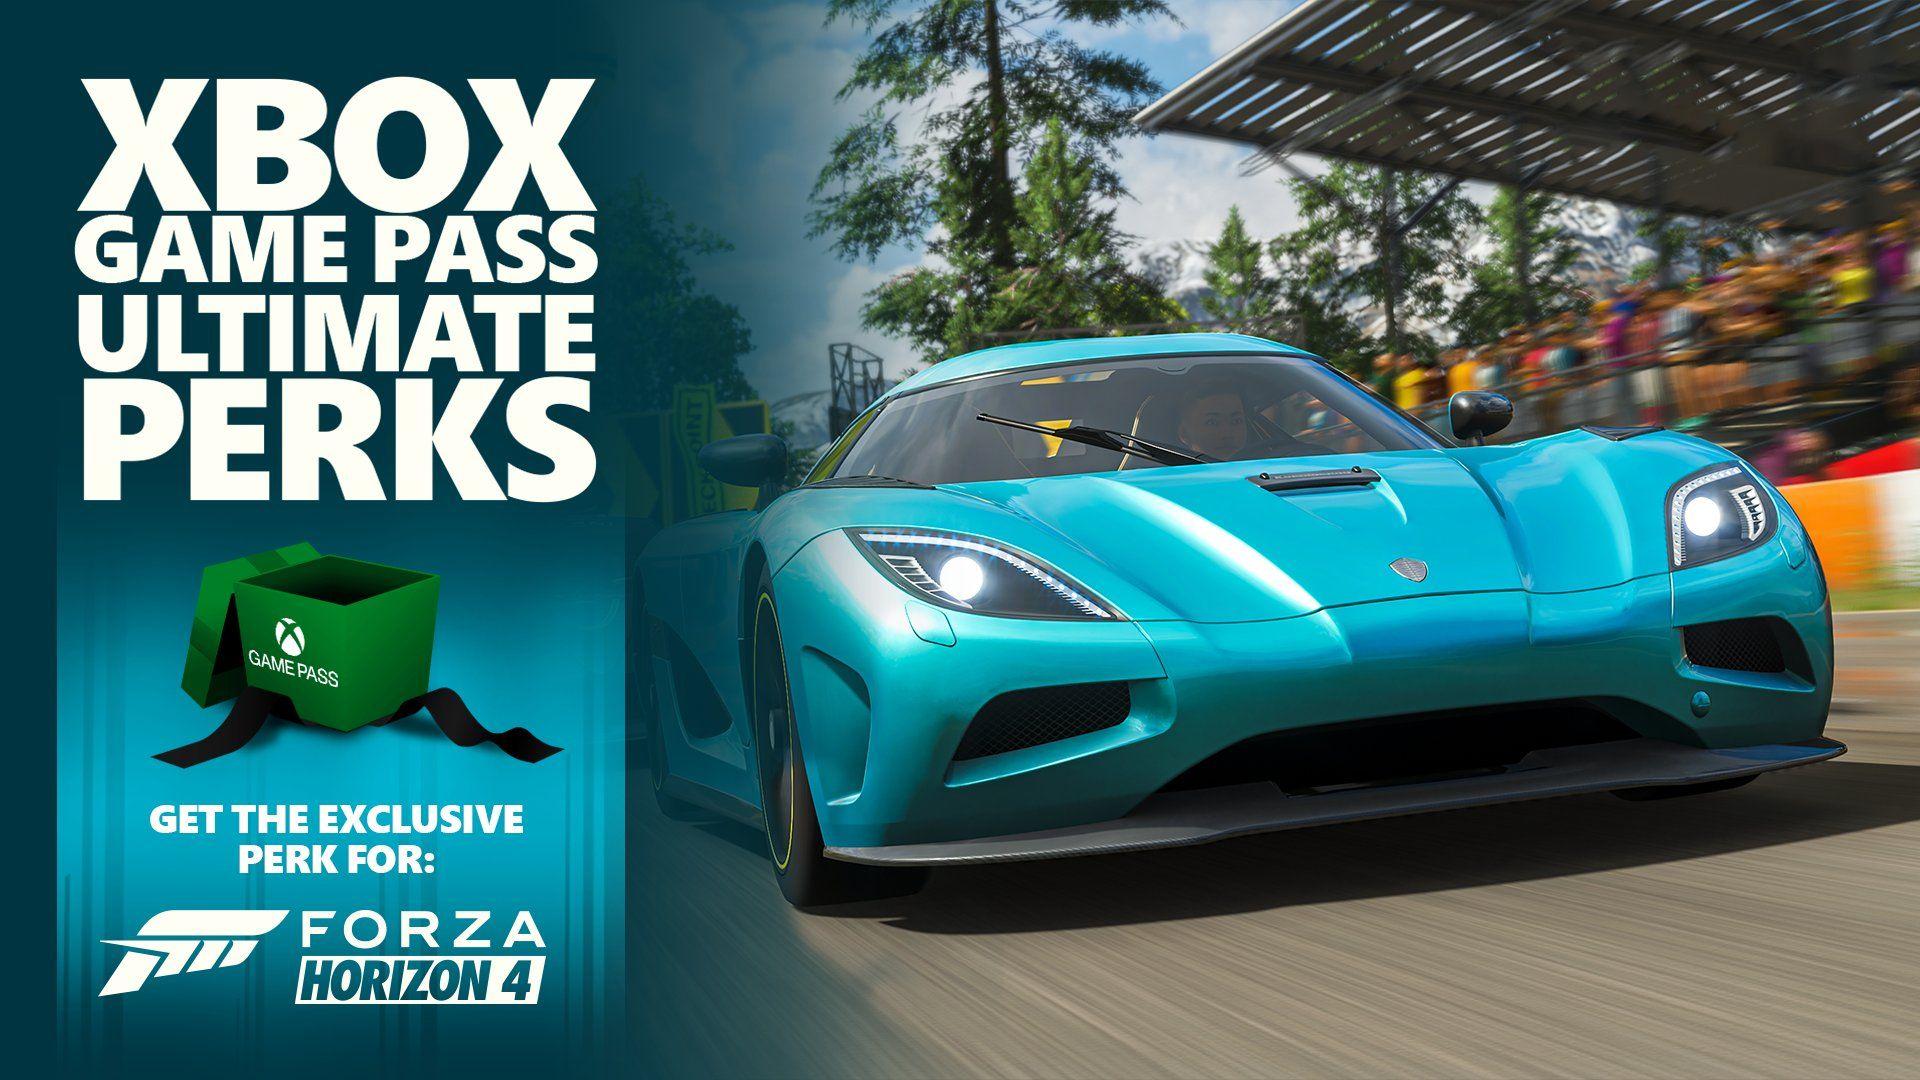 [Xbox Game Pass Ultimate] DLC 'Pack Road Trip' avec 3 voitures Koenigsegg, Maserati & Pagani offert pour Forza Horizon 4 (dématérialisé)